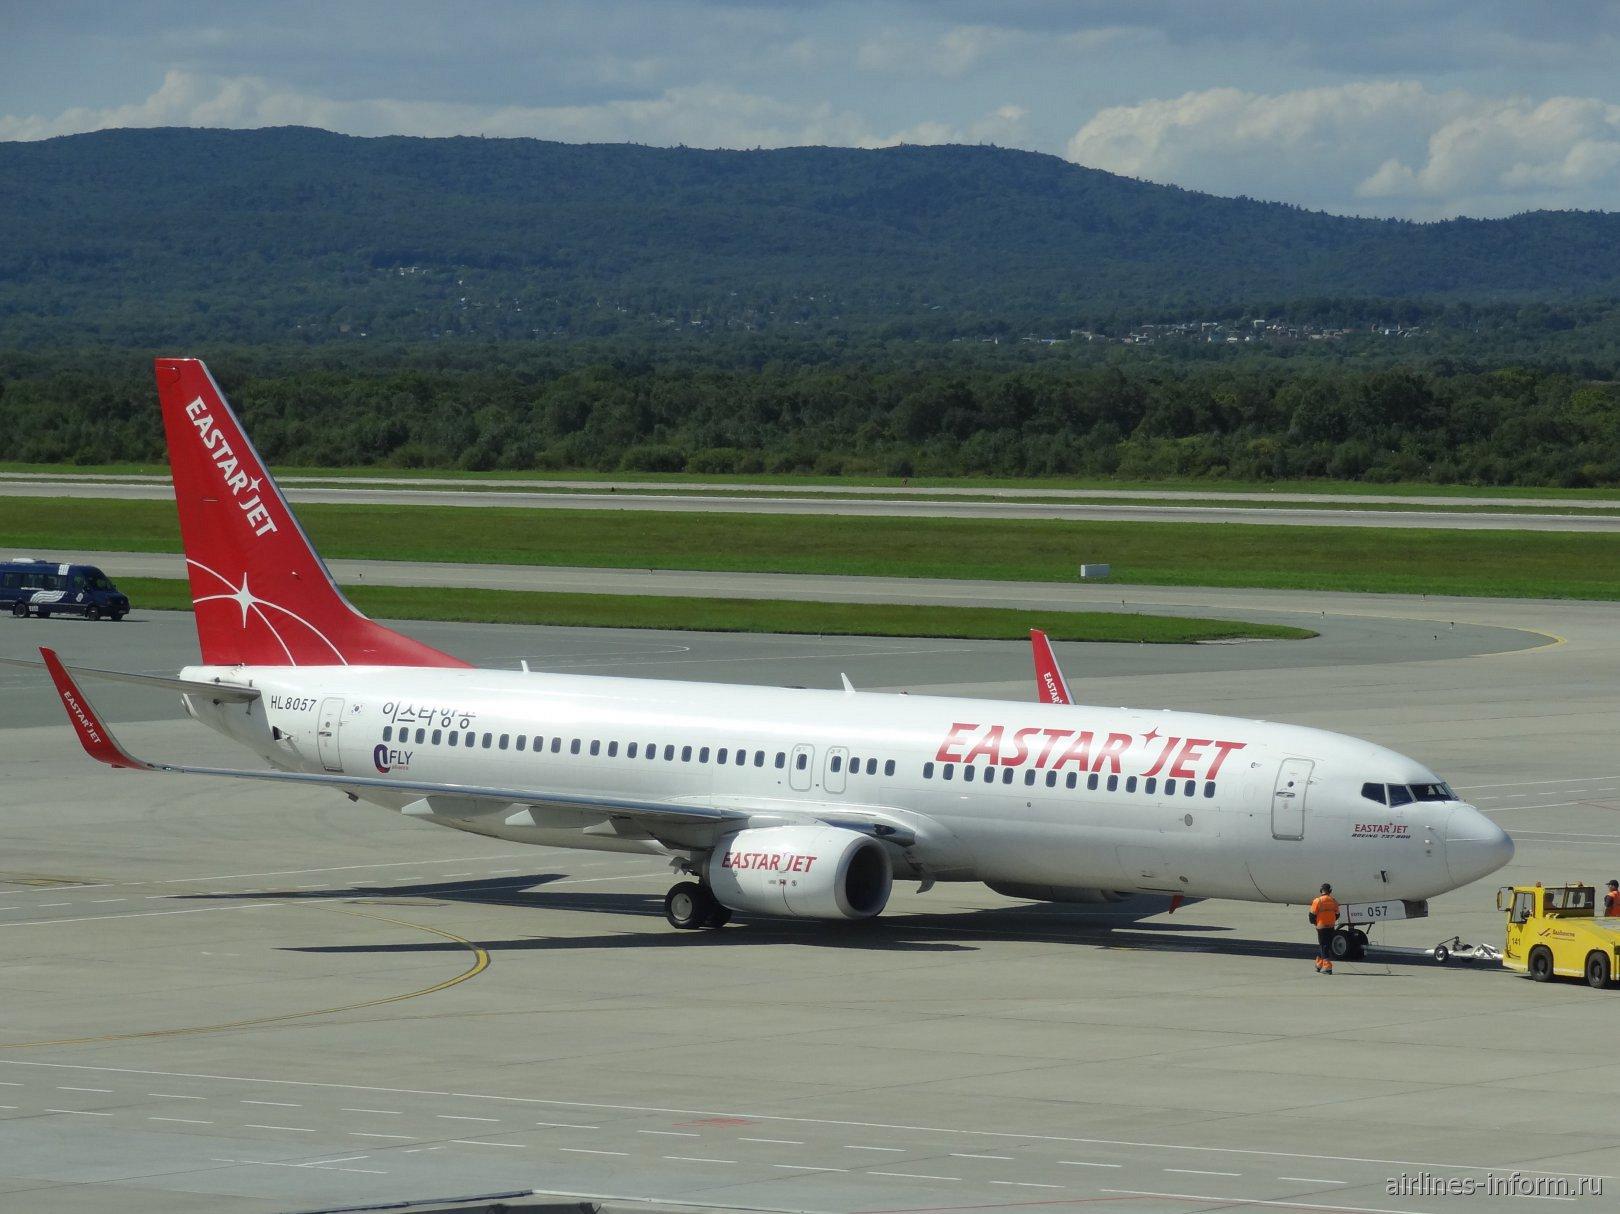 Боинг-737-800 HL8057 авиакомпании Eastar Jet в аэропорту Владивостока